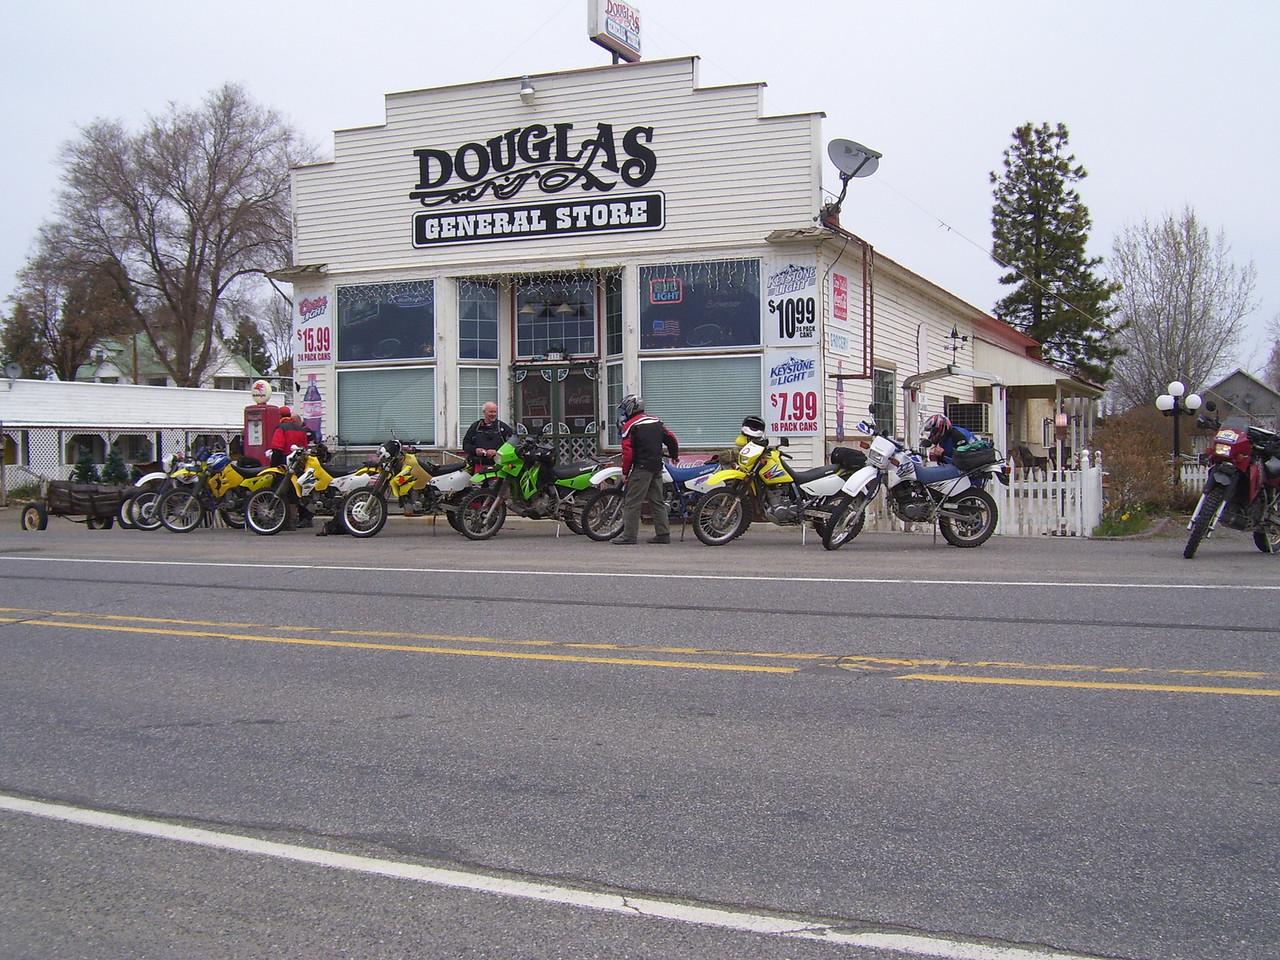 The big town of Douglas.